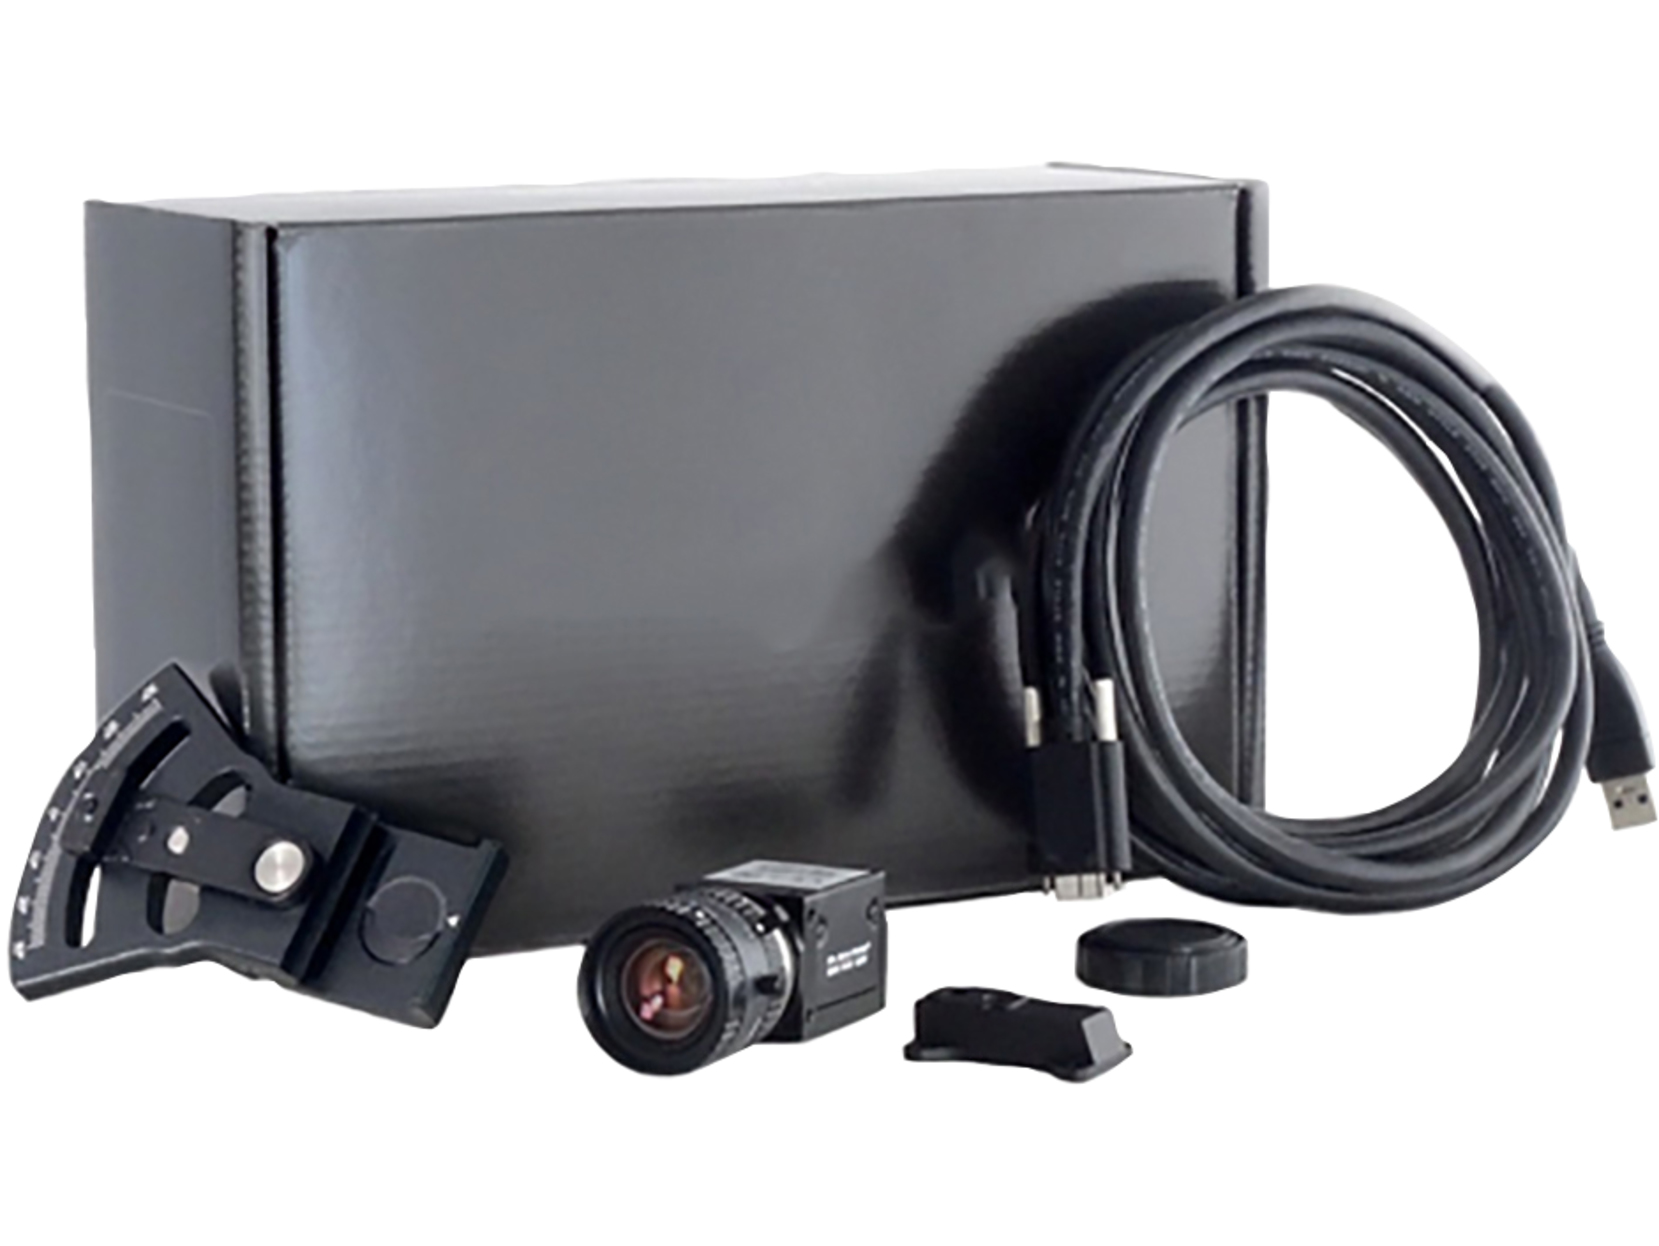 3D Dual Camera Upgrade Kit - Pro S3